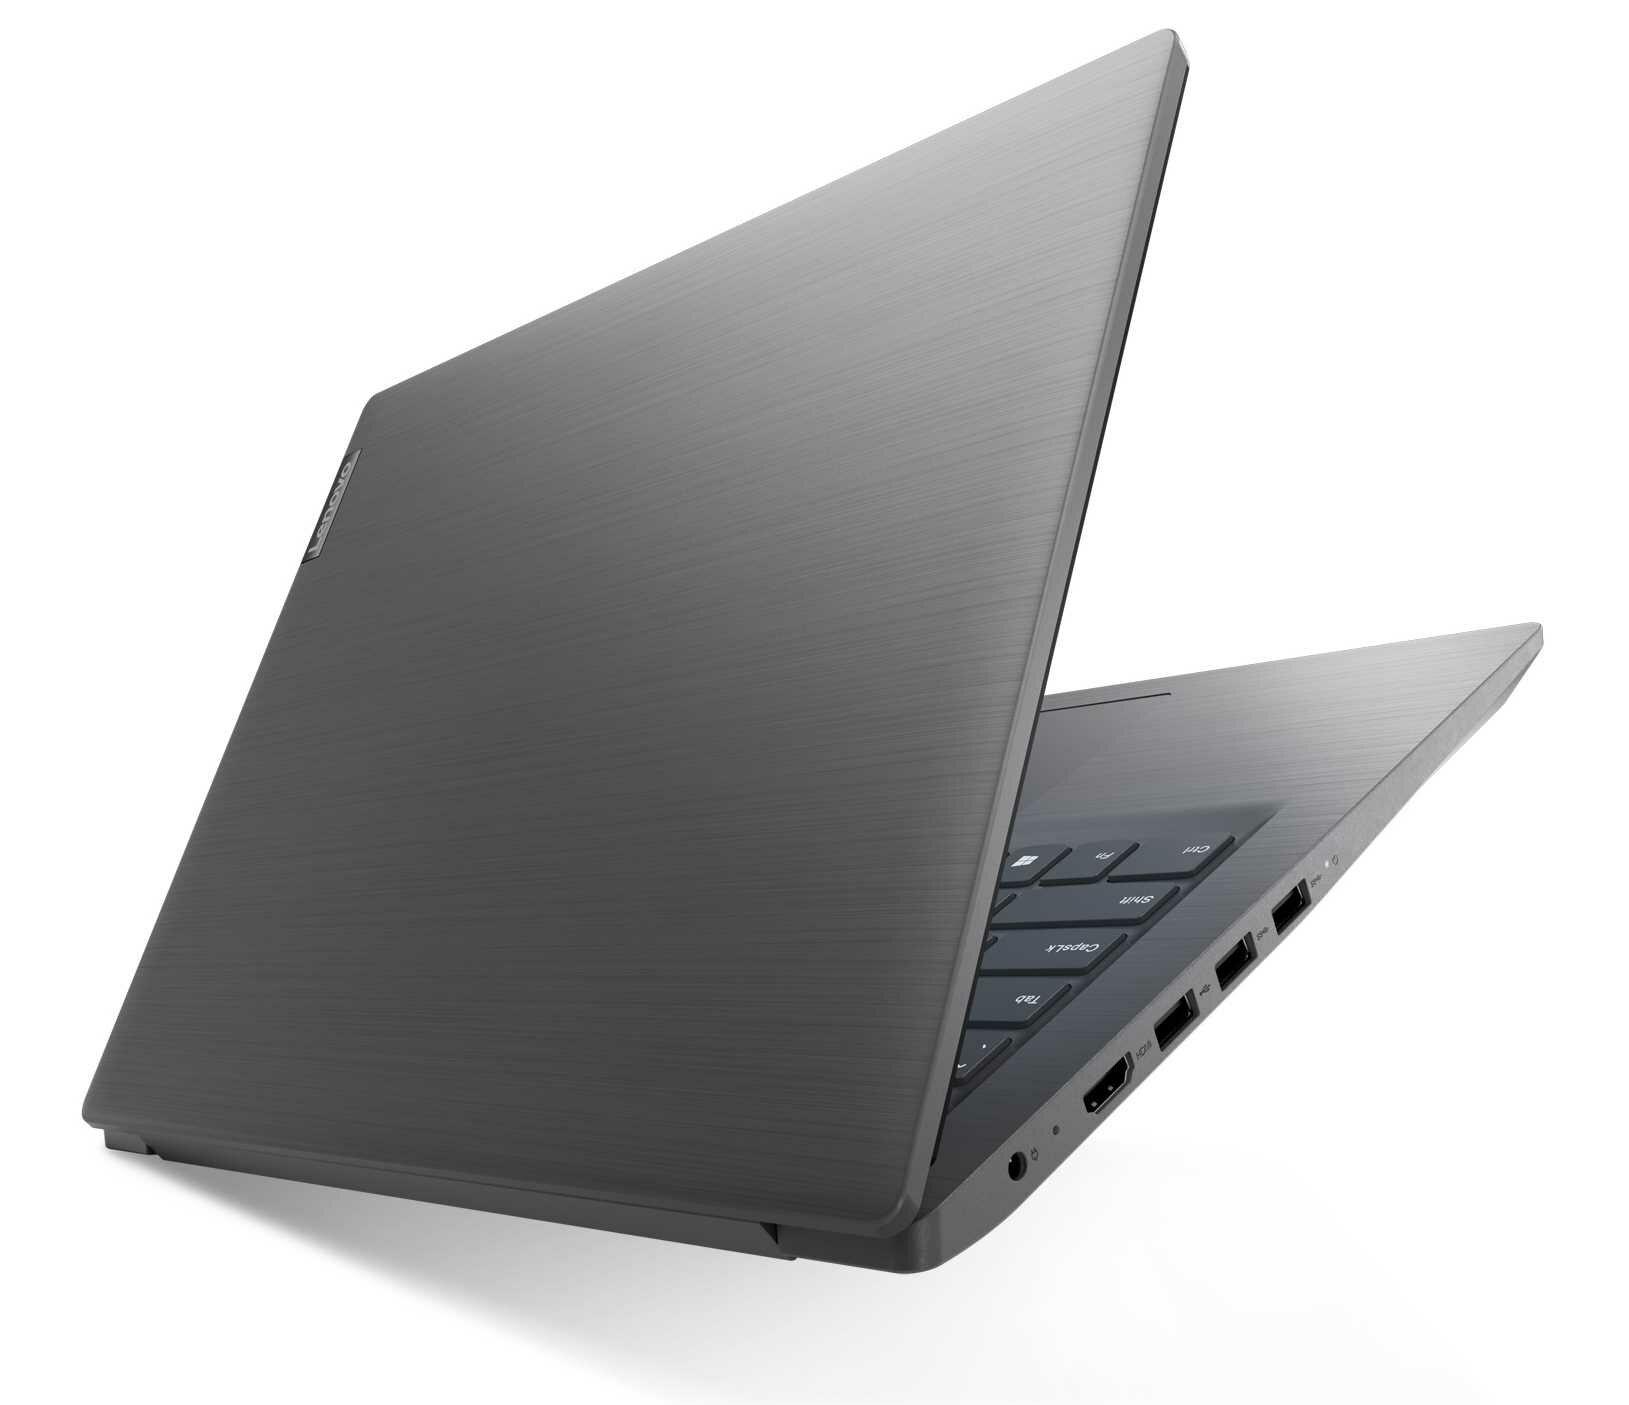 LENOVO V14 Laptop - Modul de platformă de încredere